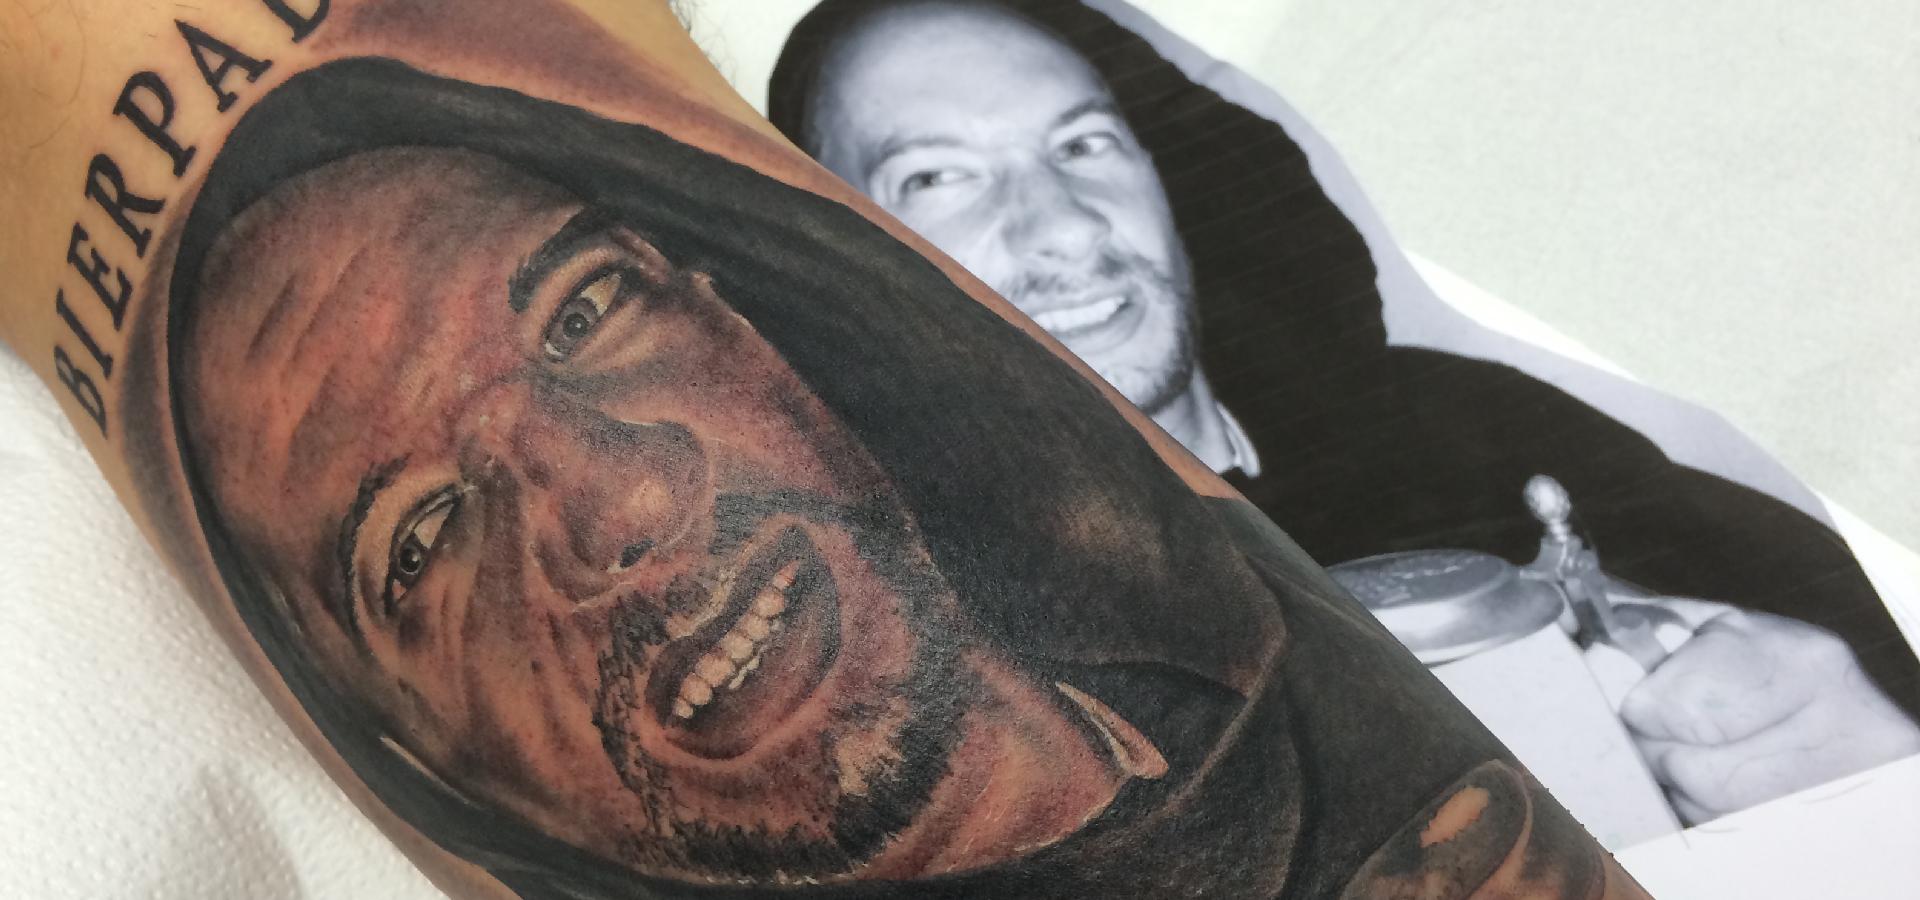 http://www.bierpadre.de/wp-content/uploads/2017/05/slider_bierpadre_tattoo-01.jpg